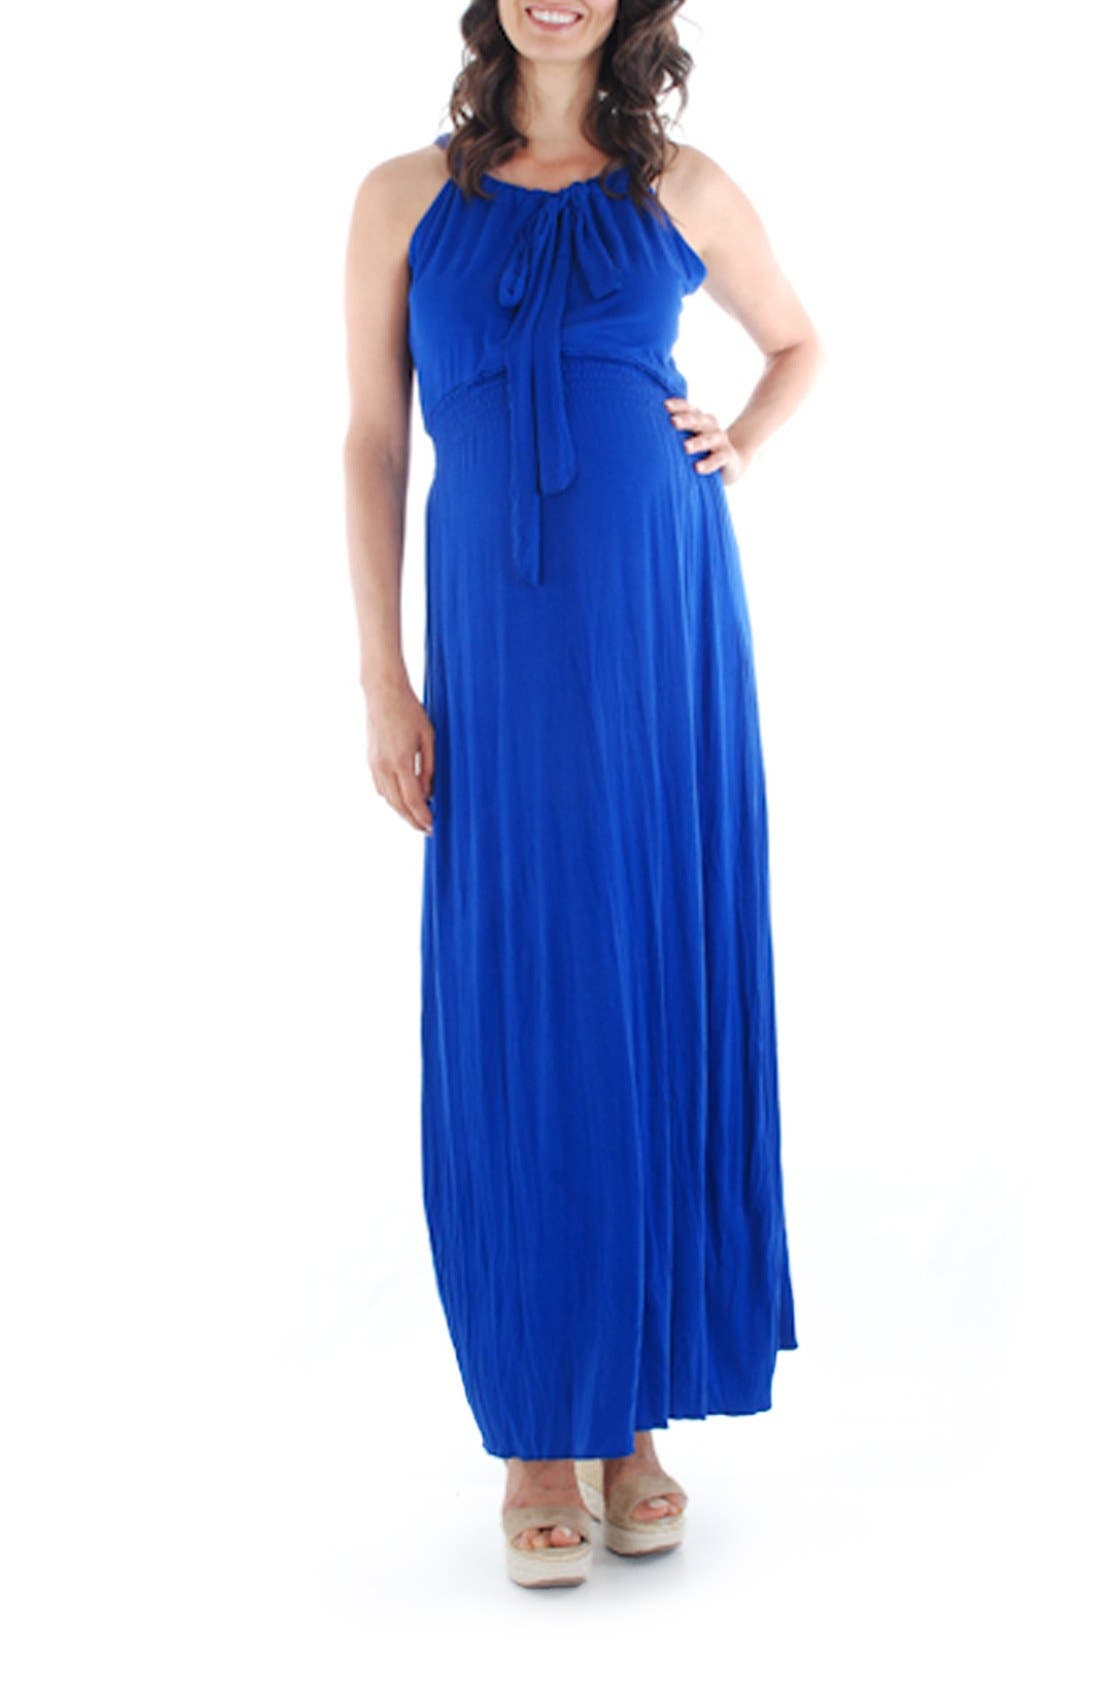 Alternate Image 1 Selected - Everly Grey 'Harmony' Maternity Maxi Dress